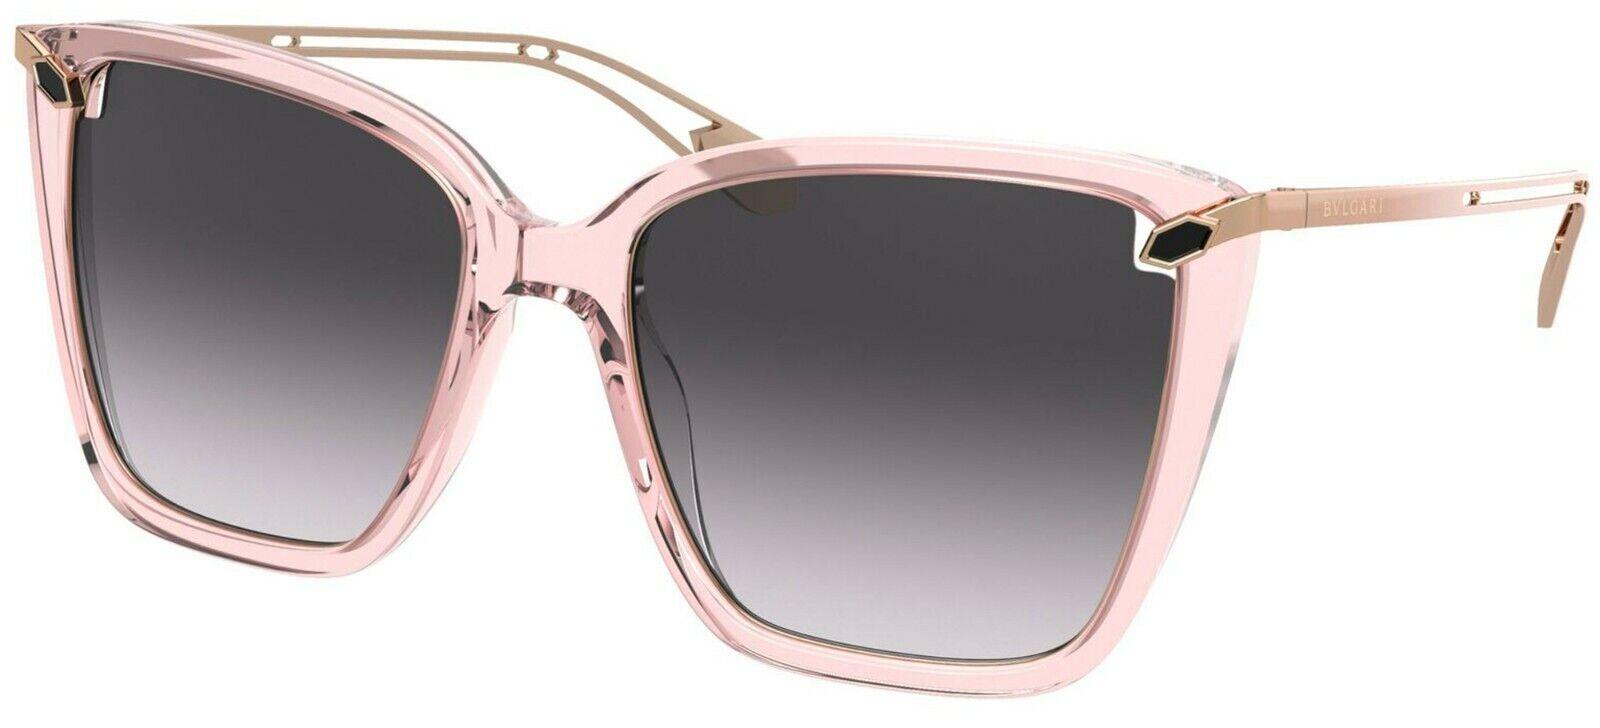 Bvlgari SERPENTI BV 8232 Pink/Grey Shaded (5470/8G) Sunglasses